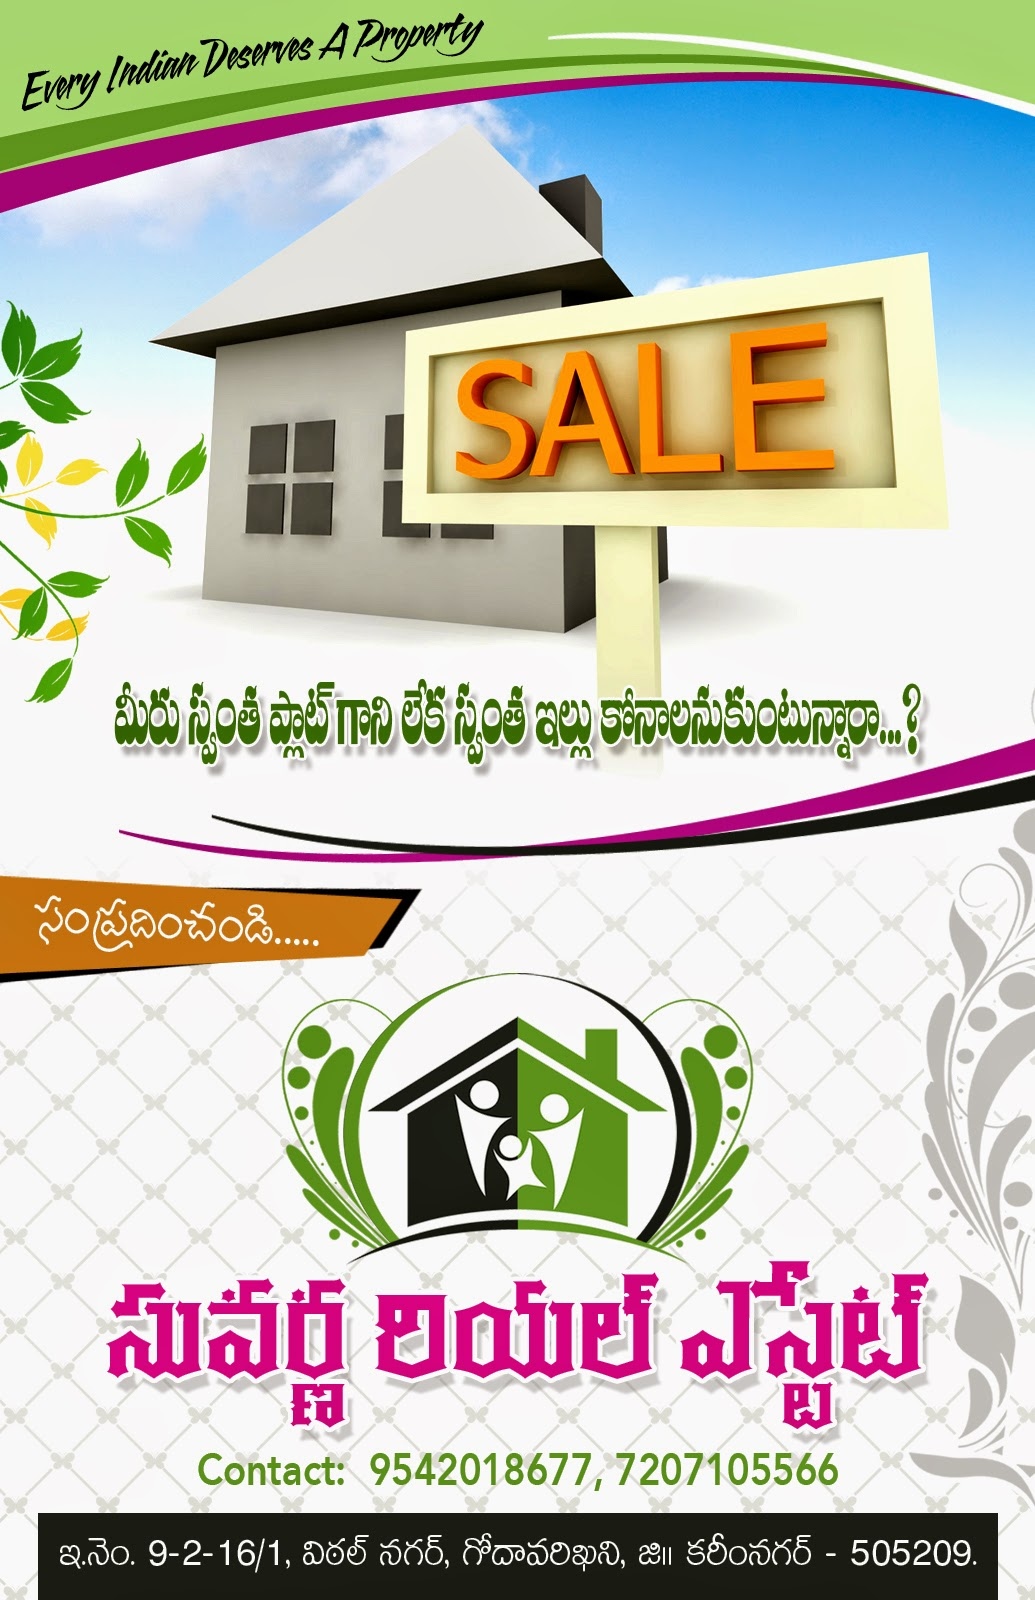 suvarna real estate best brochure design naveengfx real estate best brochure design